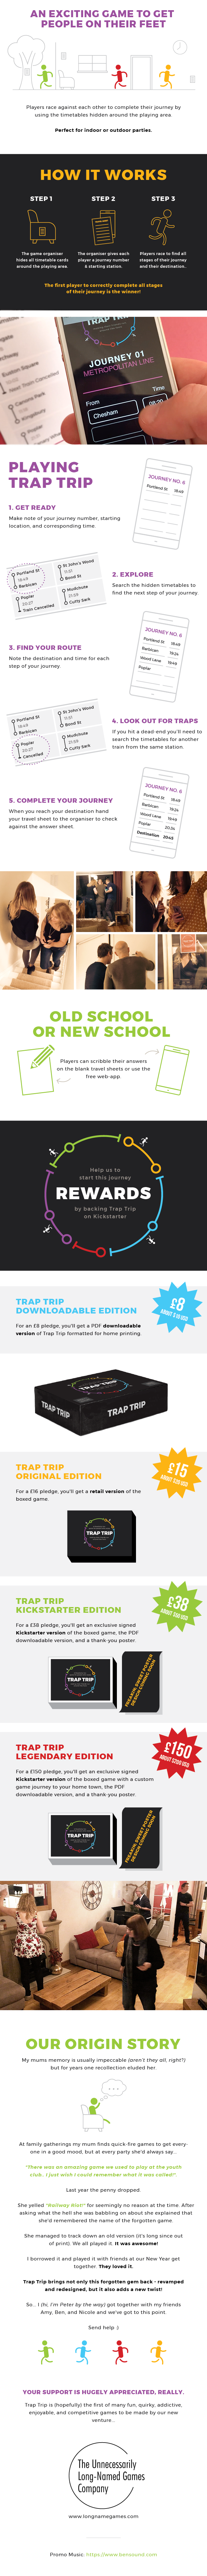 Trap Trip Kickstarter Game